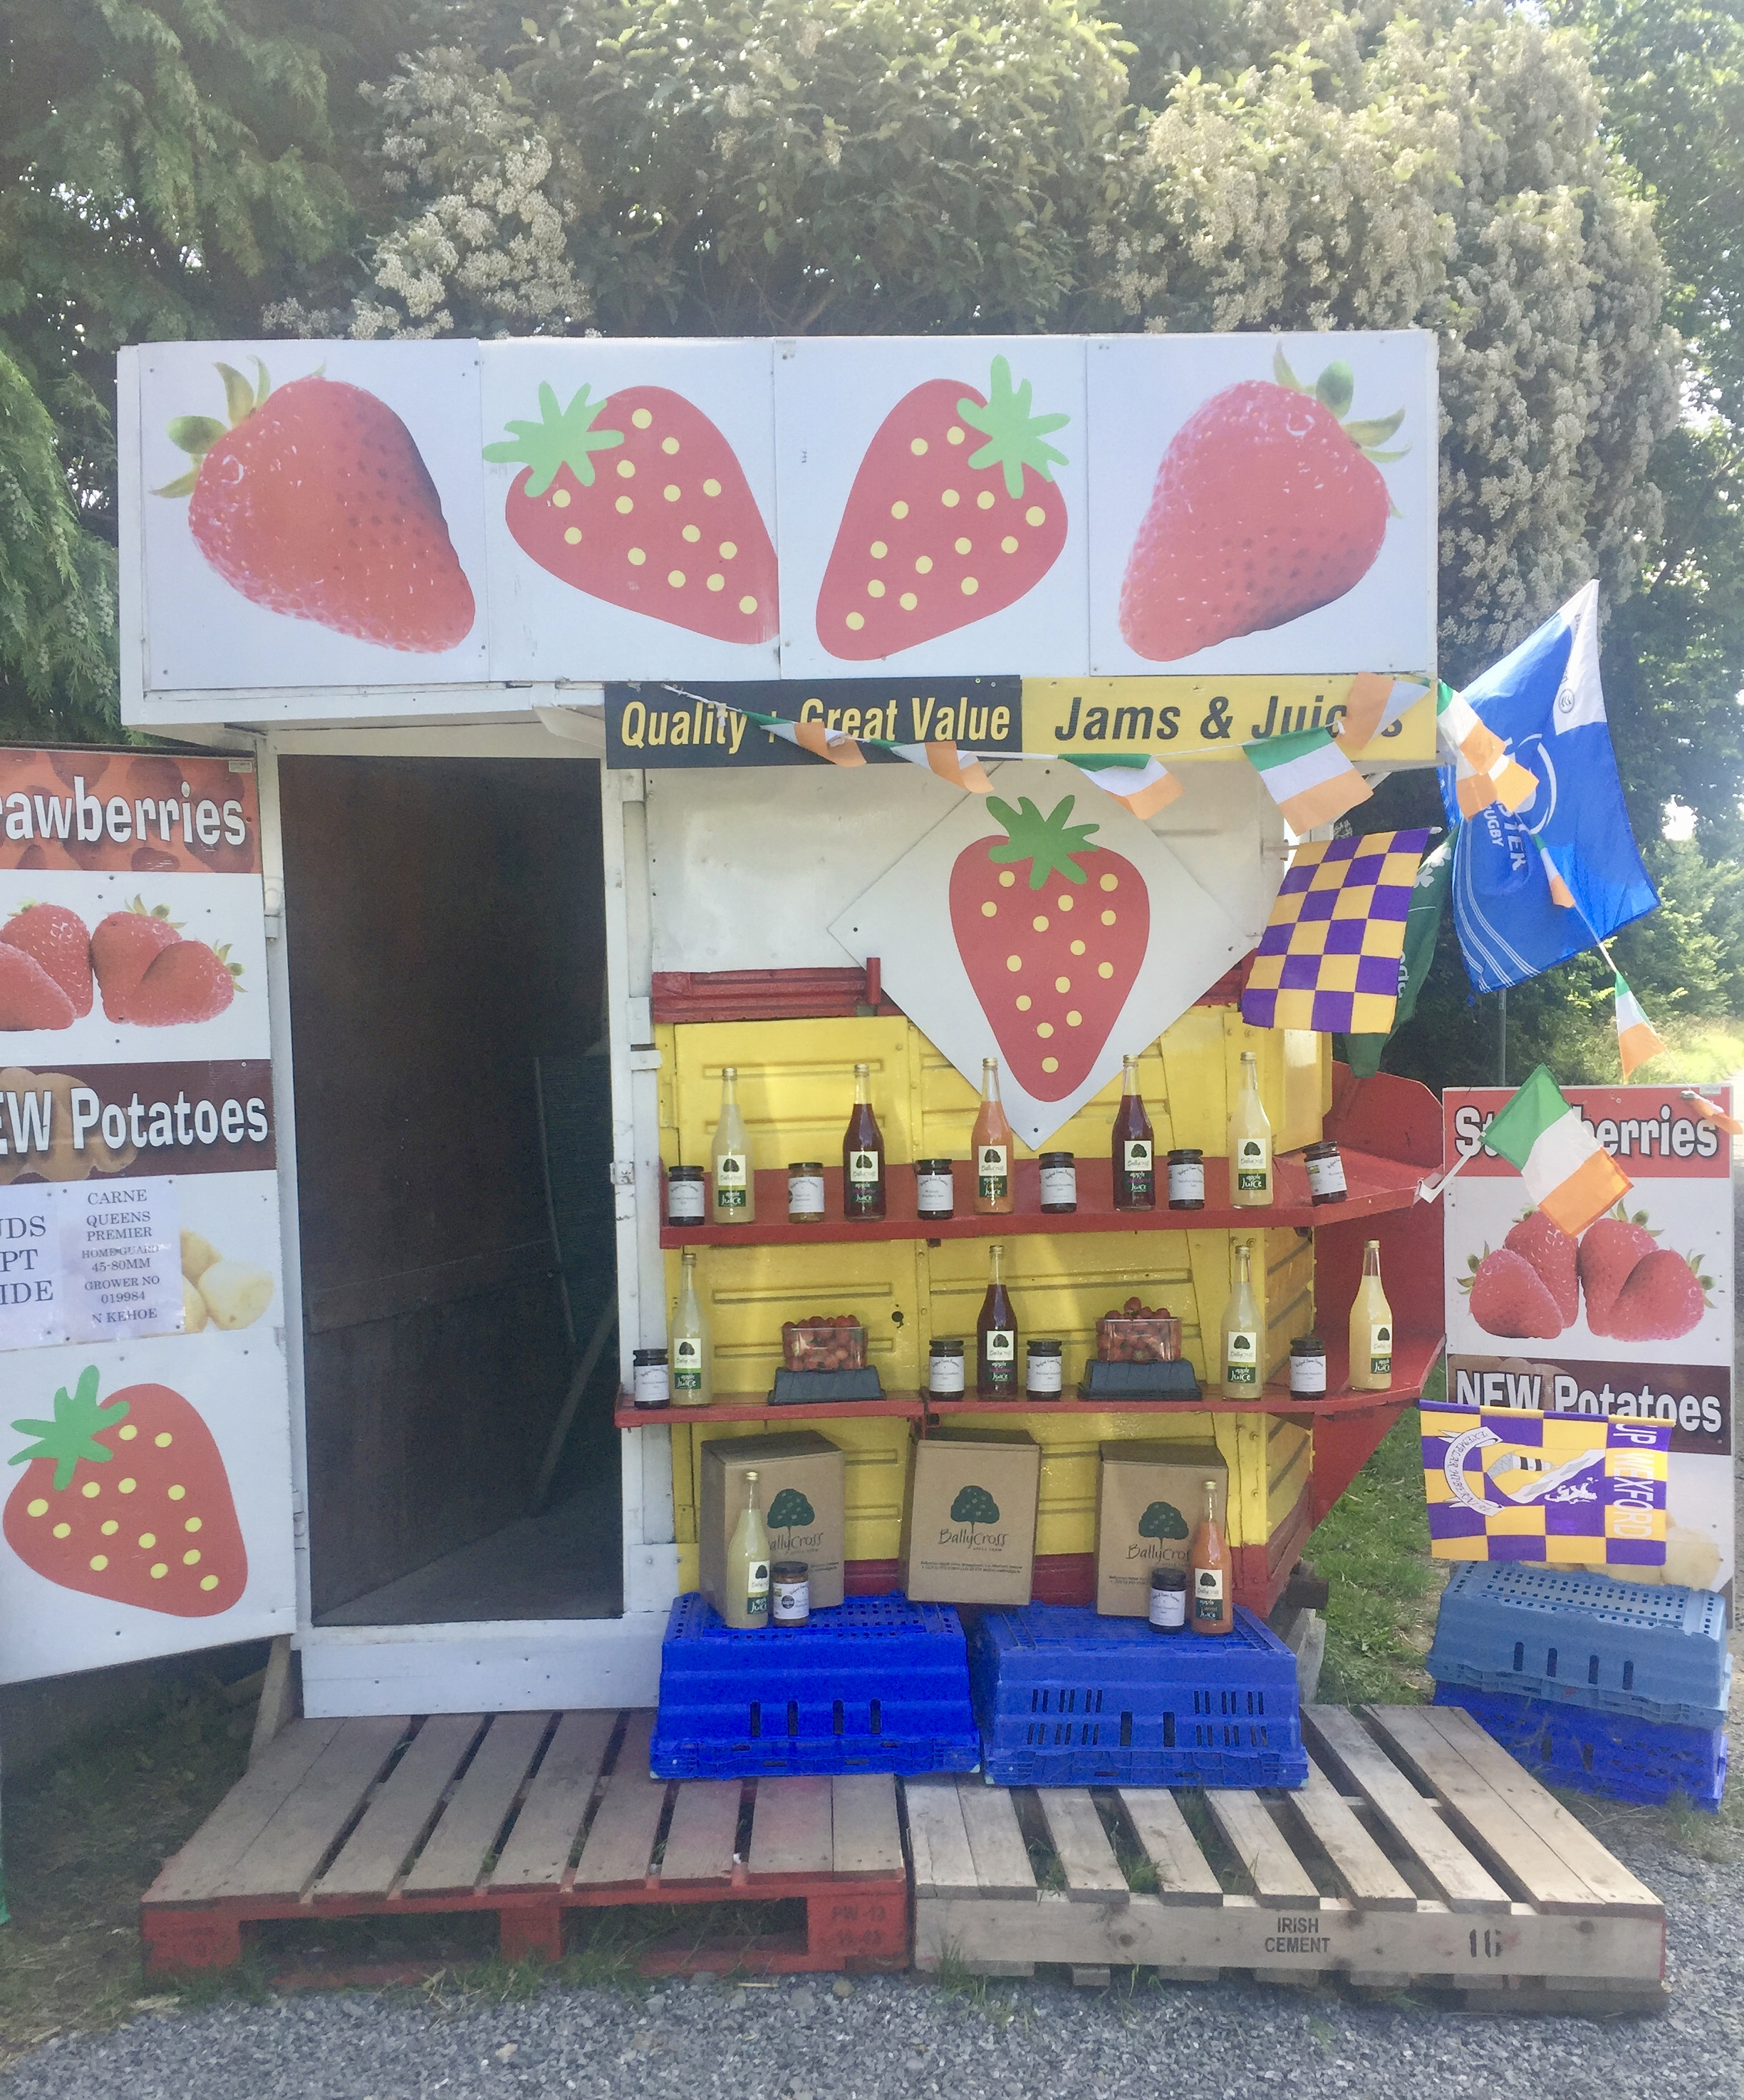 Wexford Strawberries